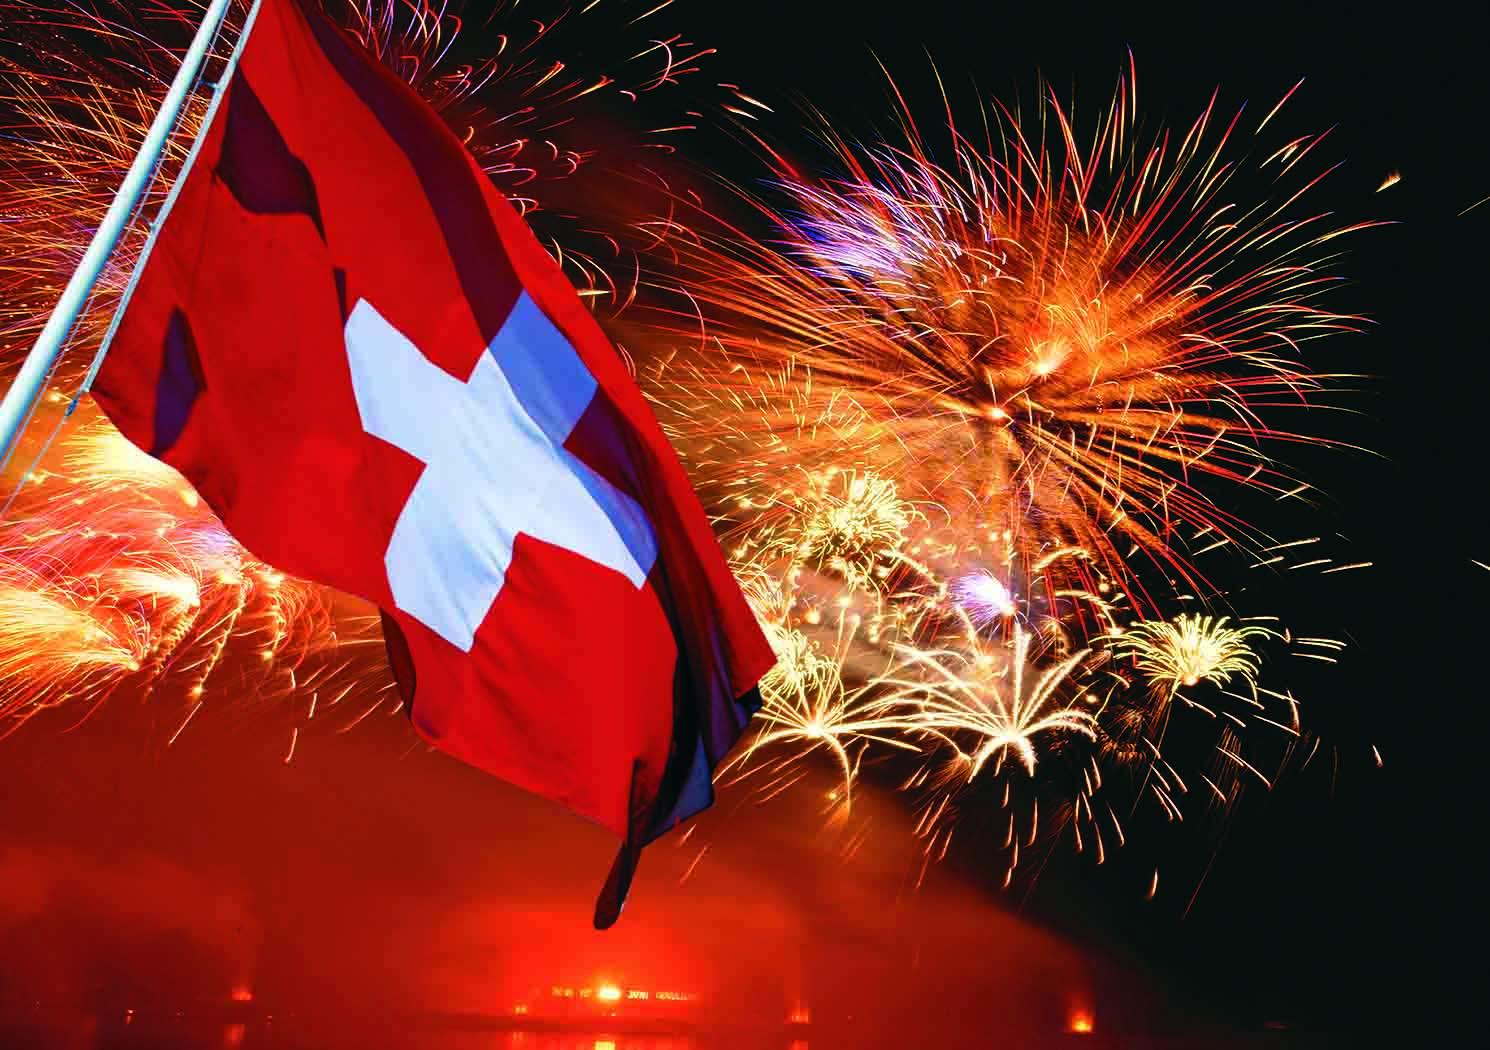 Swiss National Day, August 1st - Switzerland Tourism  |1 August